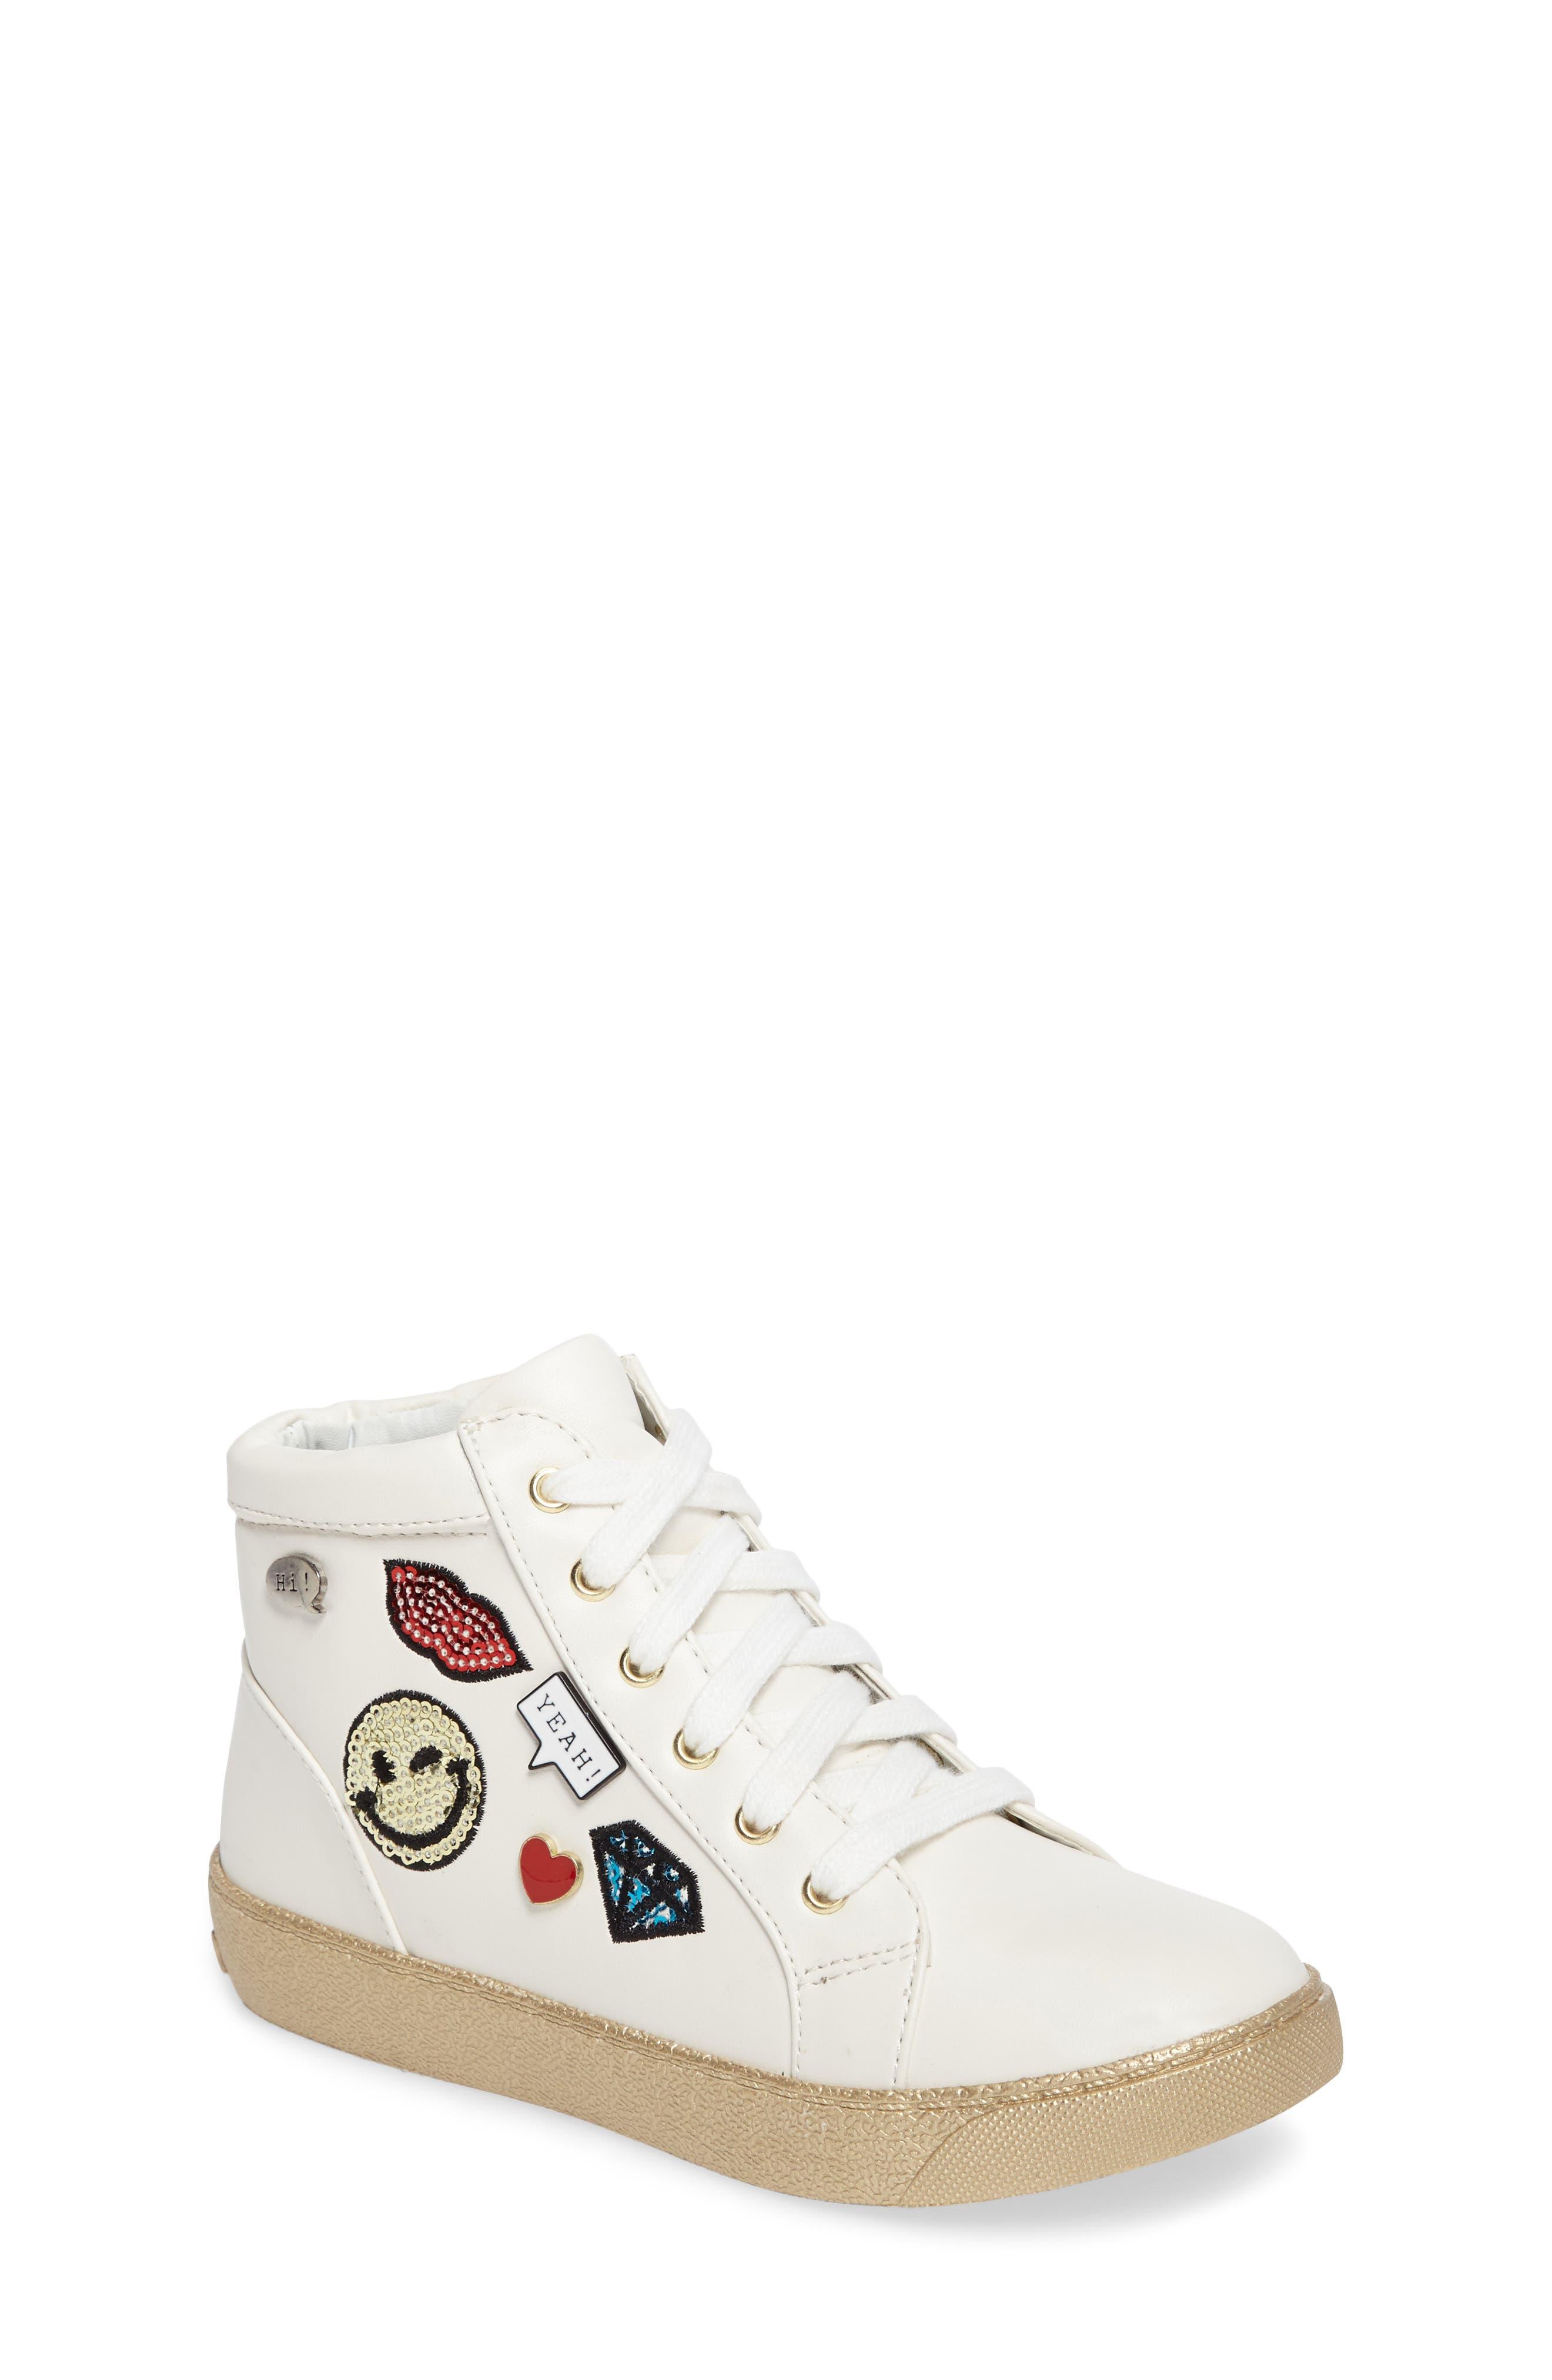 SAM EDELMAN Sloane Odette Sneaker